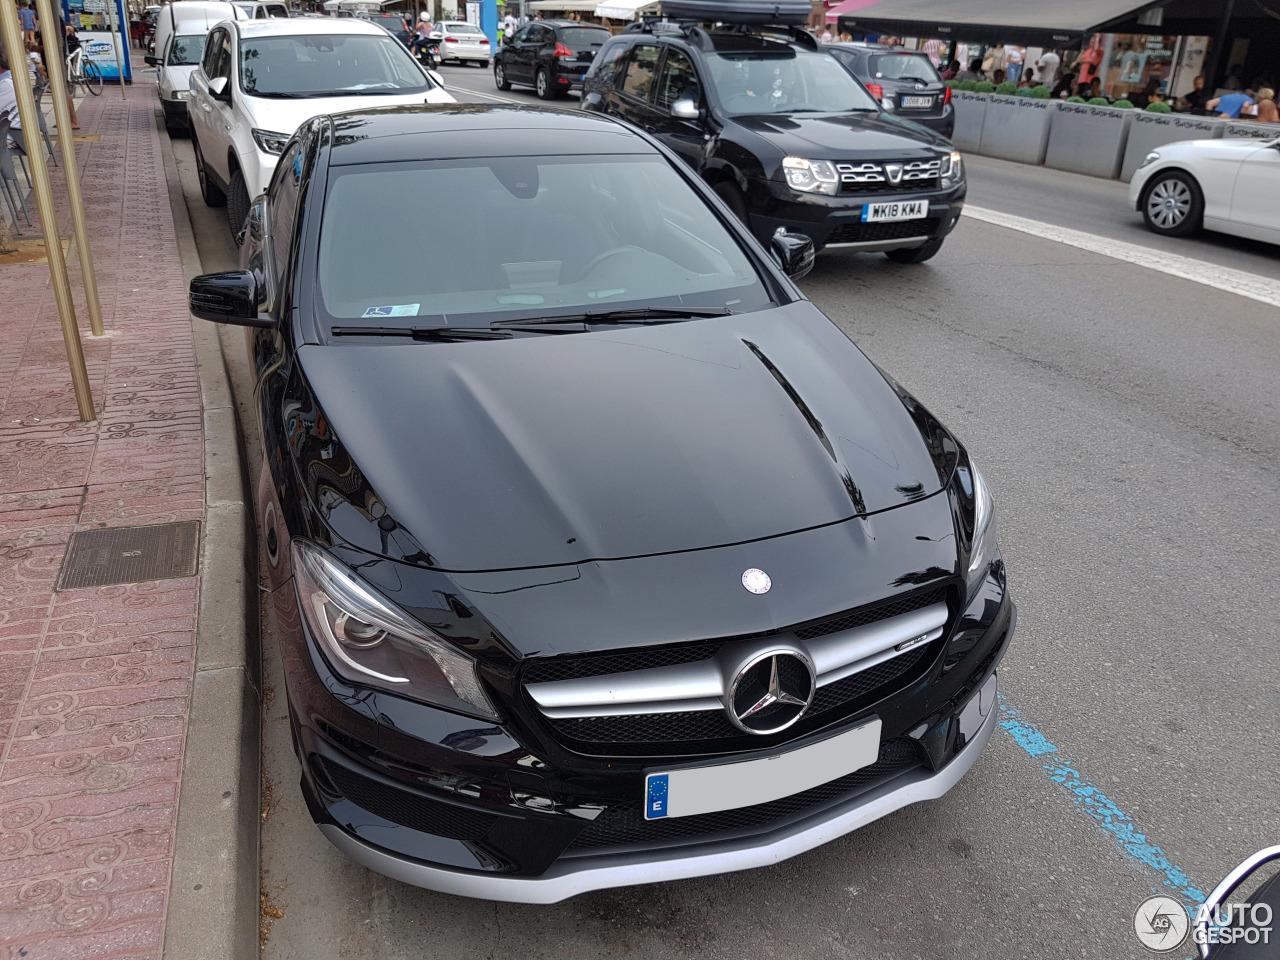 Mercedes benz cla 45 amg c117 13 august 2018 autogespot for La mercedes benz